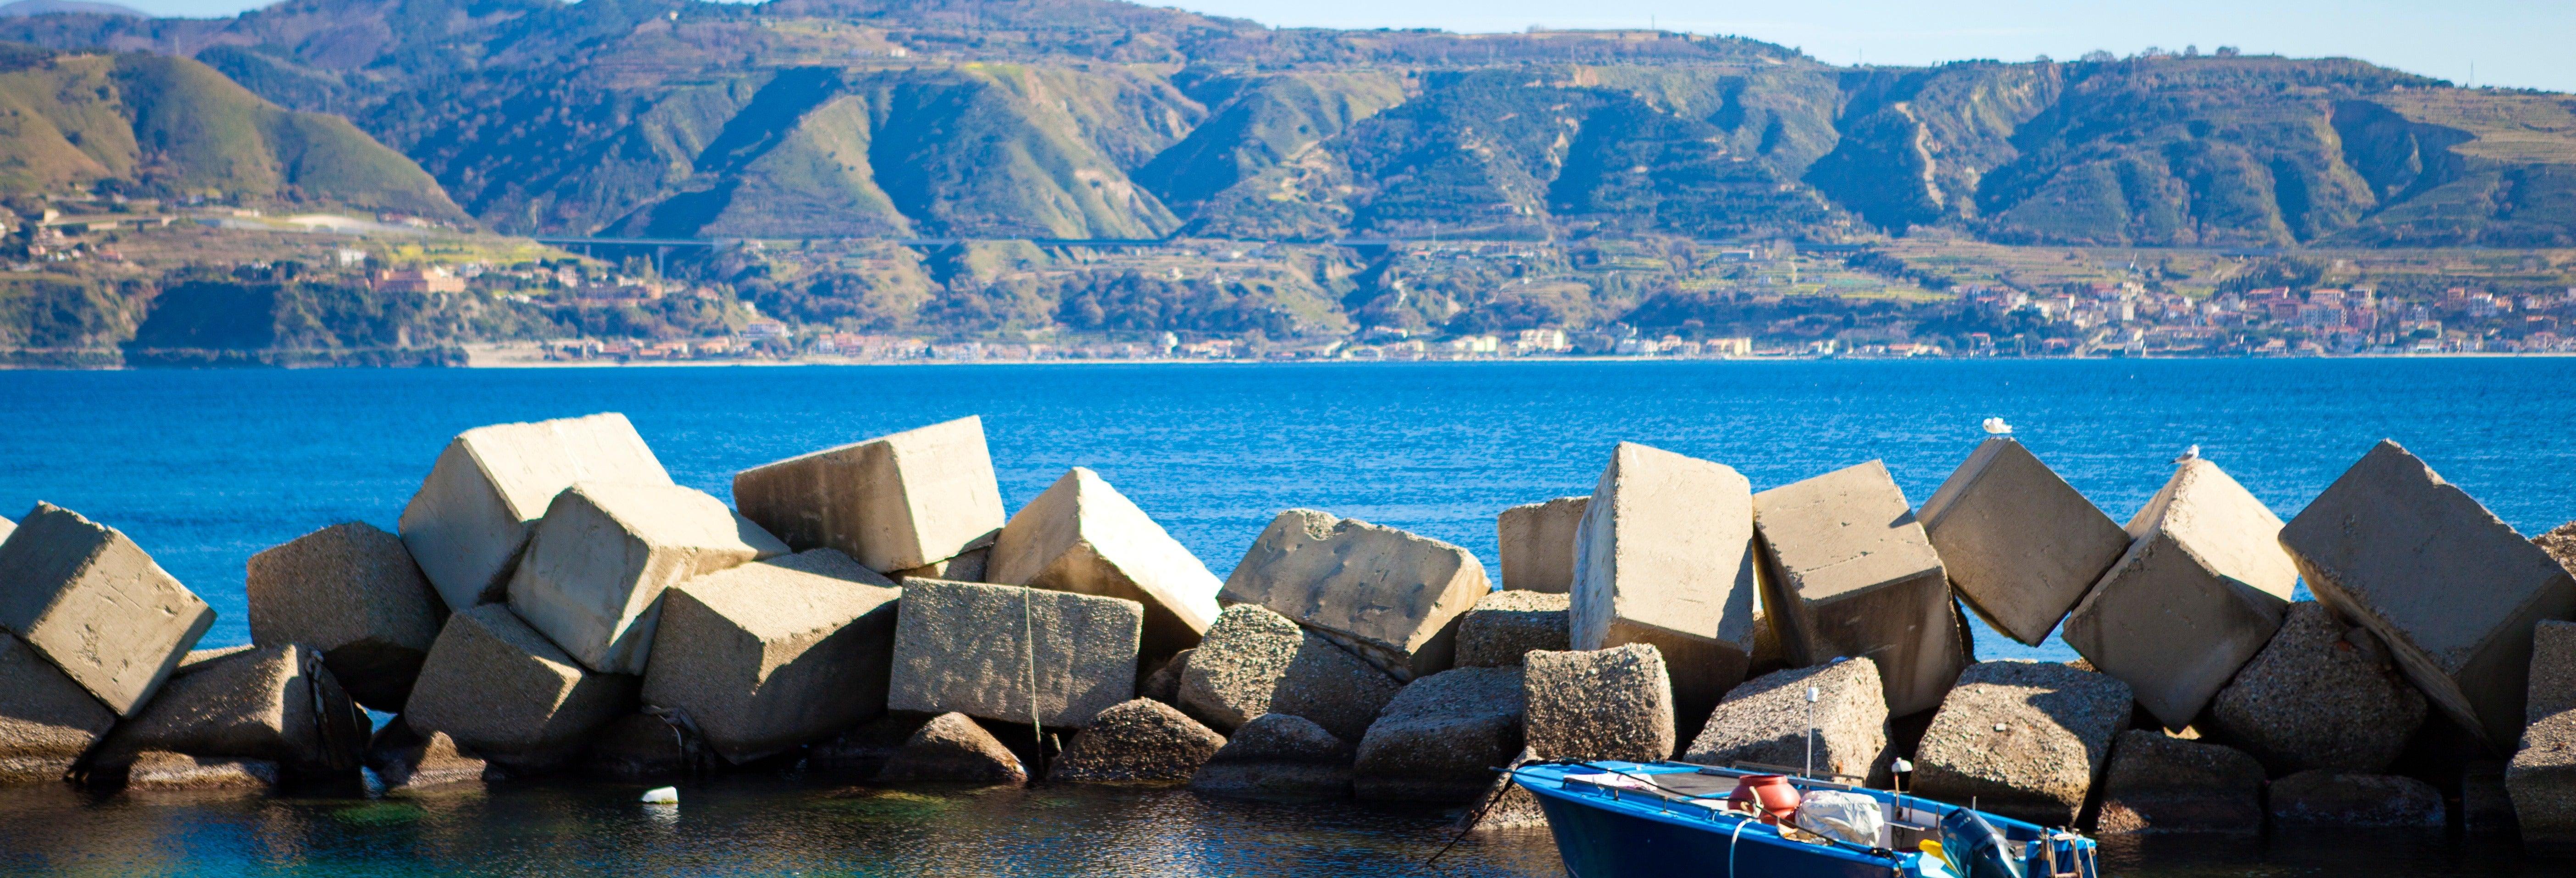 Regio de Calabria